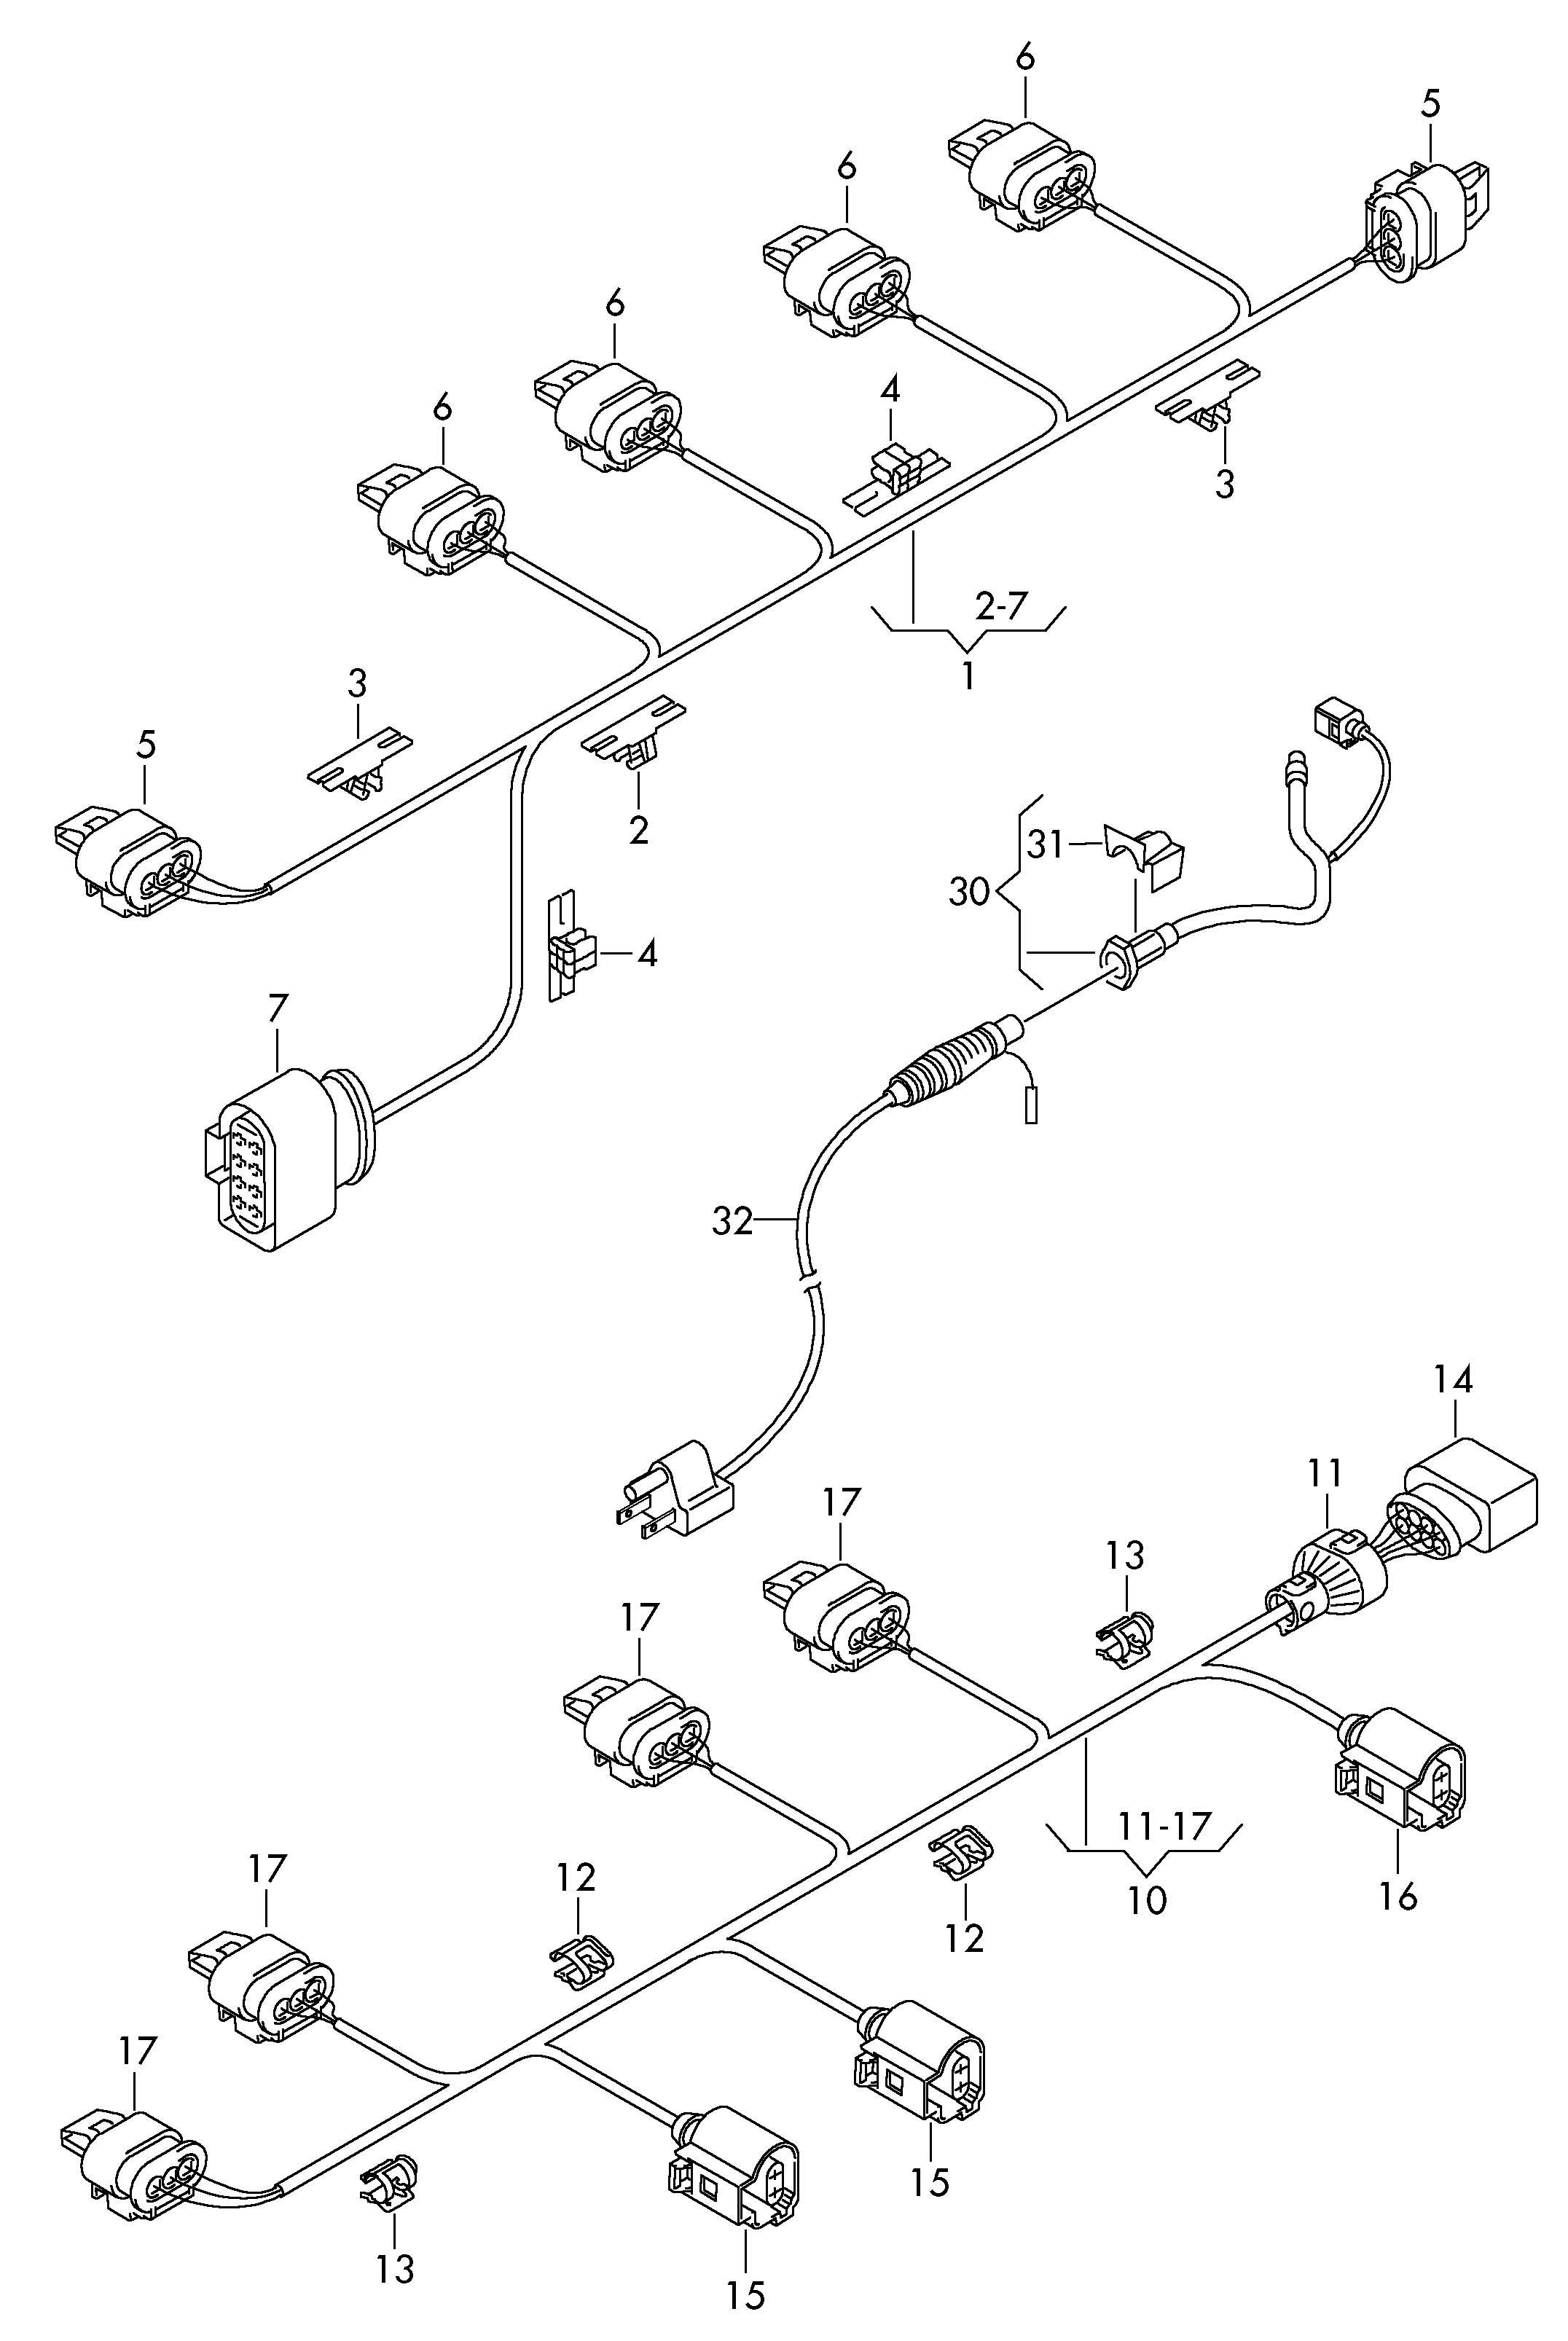 Volkswagen Gti Cord For Engine Block Adapter Wiring